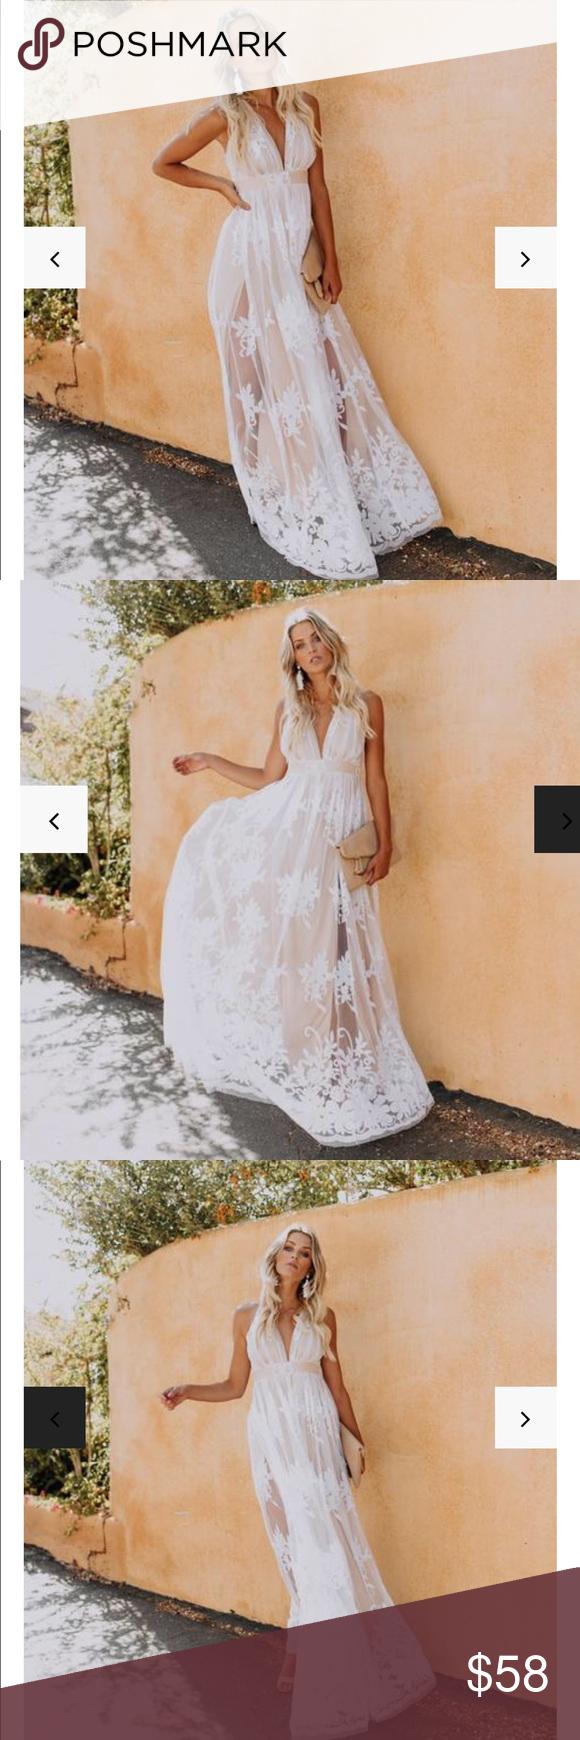 Vici Antonia Dress Dresses Vici Dress Wedding Dresses Lace [ 1740 x 580 Pixel ]